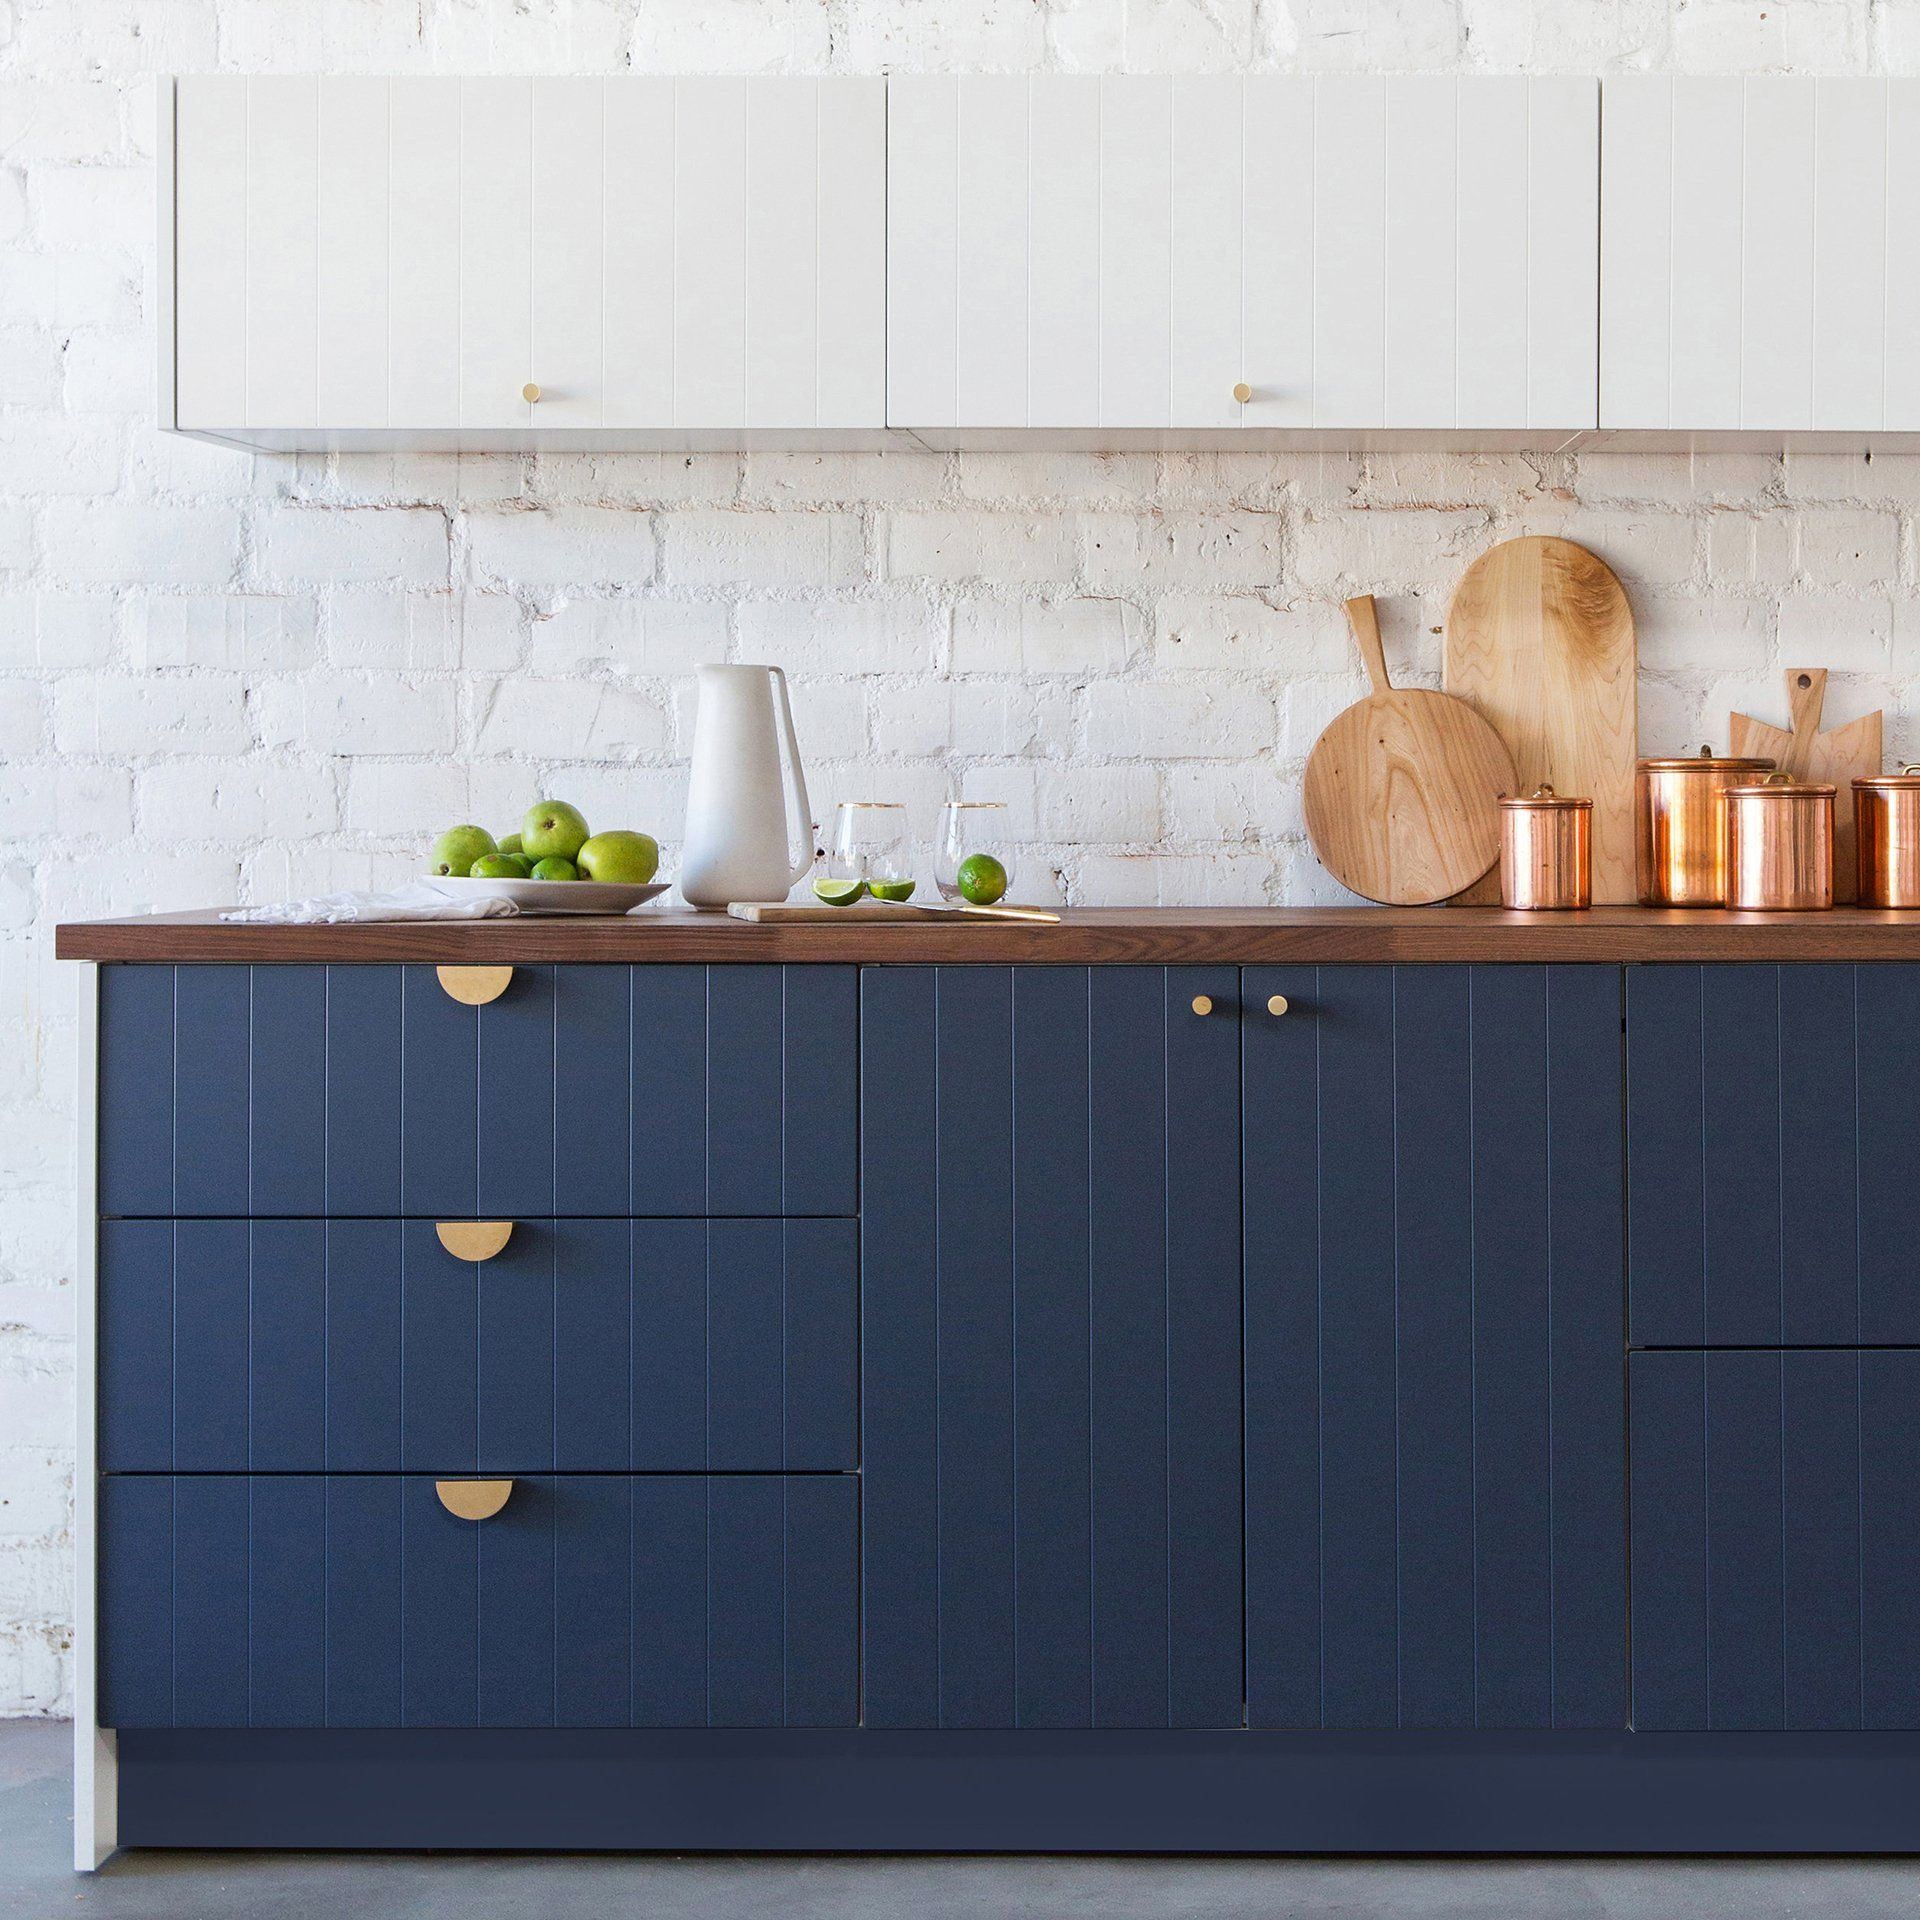 Sss Night Sky Beaded Beadboard Kitchen Kitchen Cabinets Cabinet Door Designs